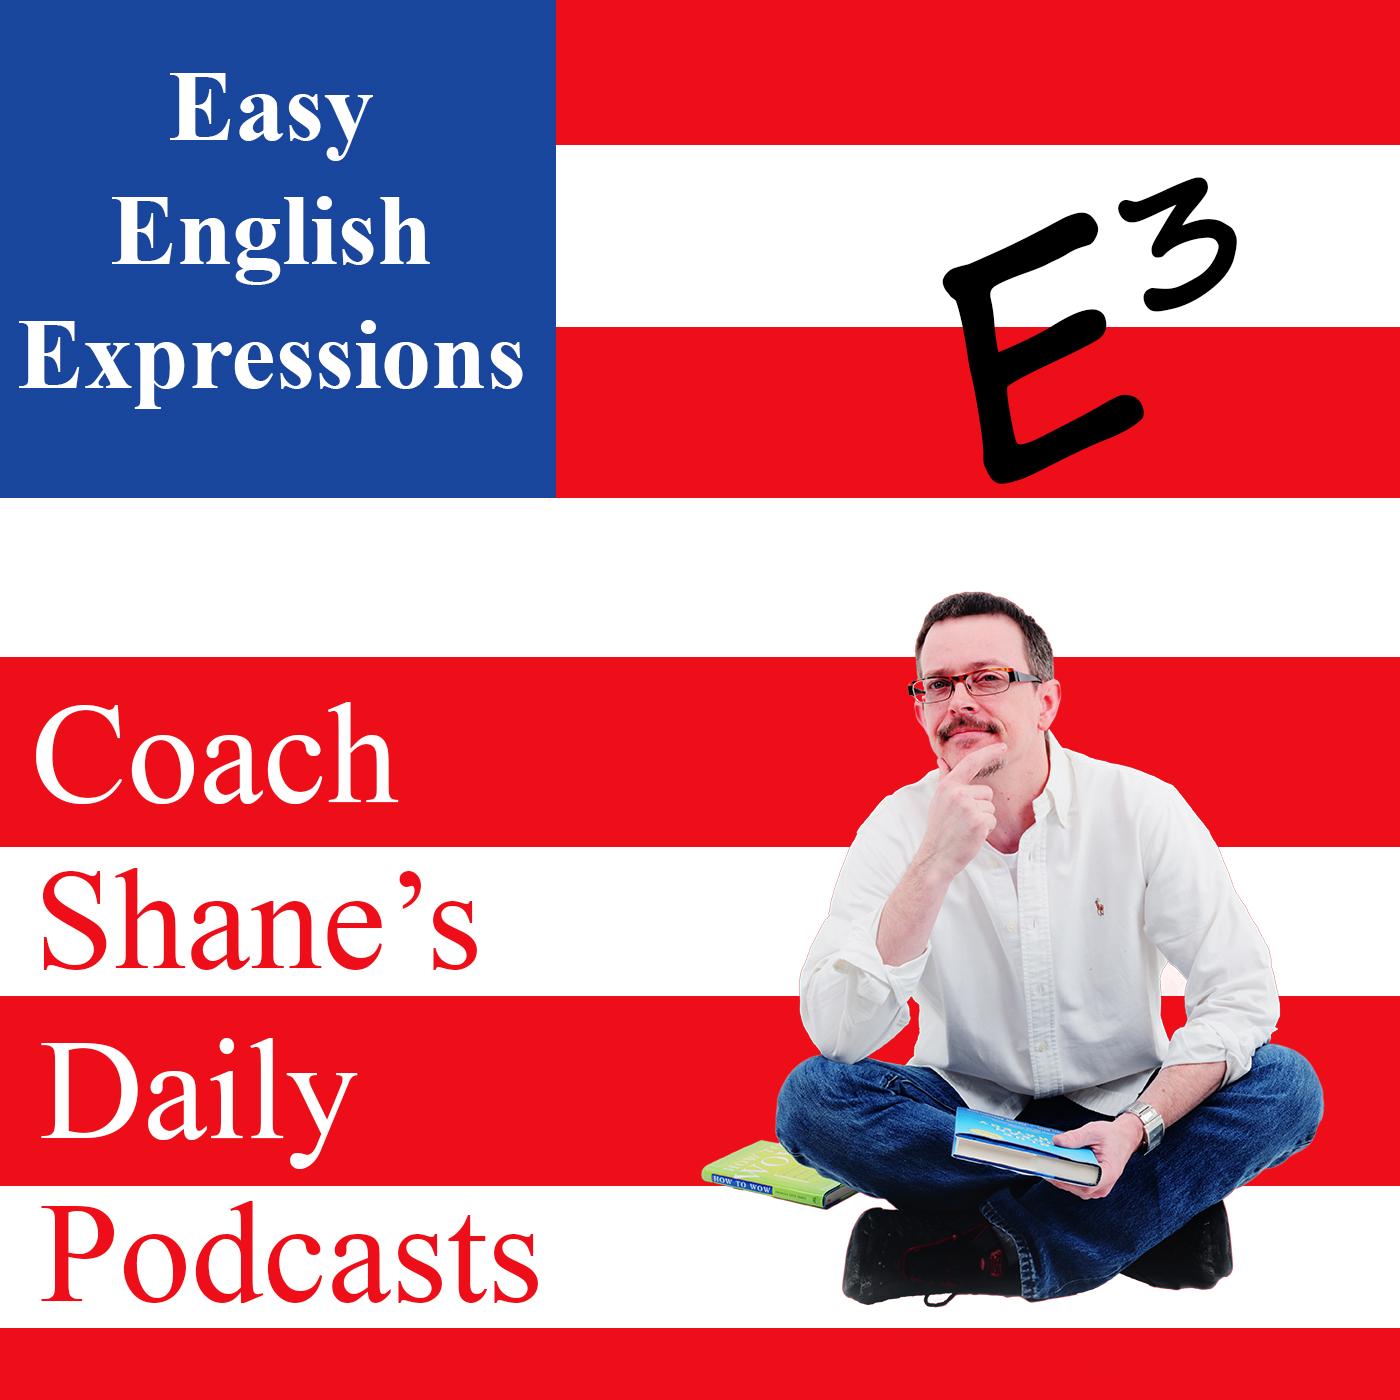 73 Daily Easy English Expression PODCAST—to TWEAK something